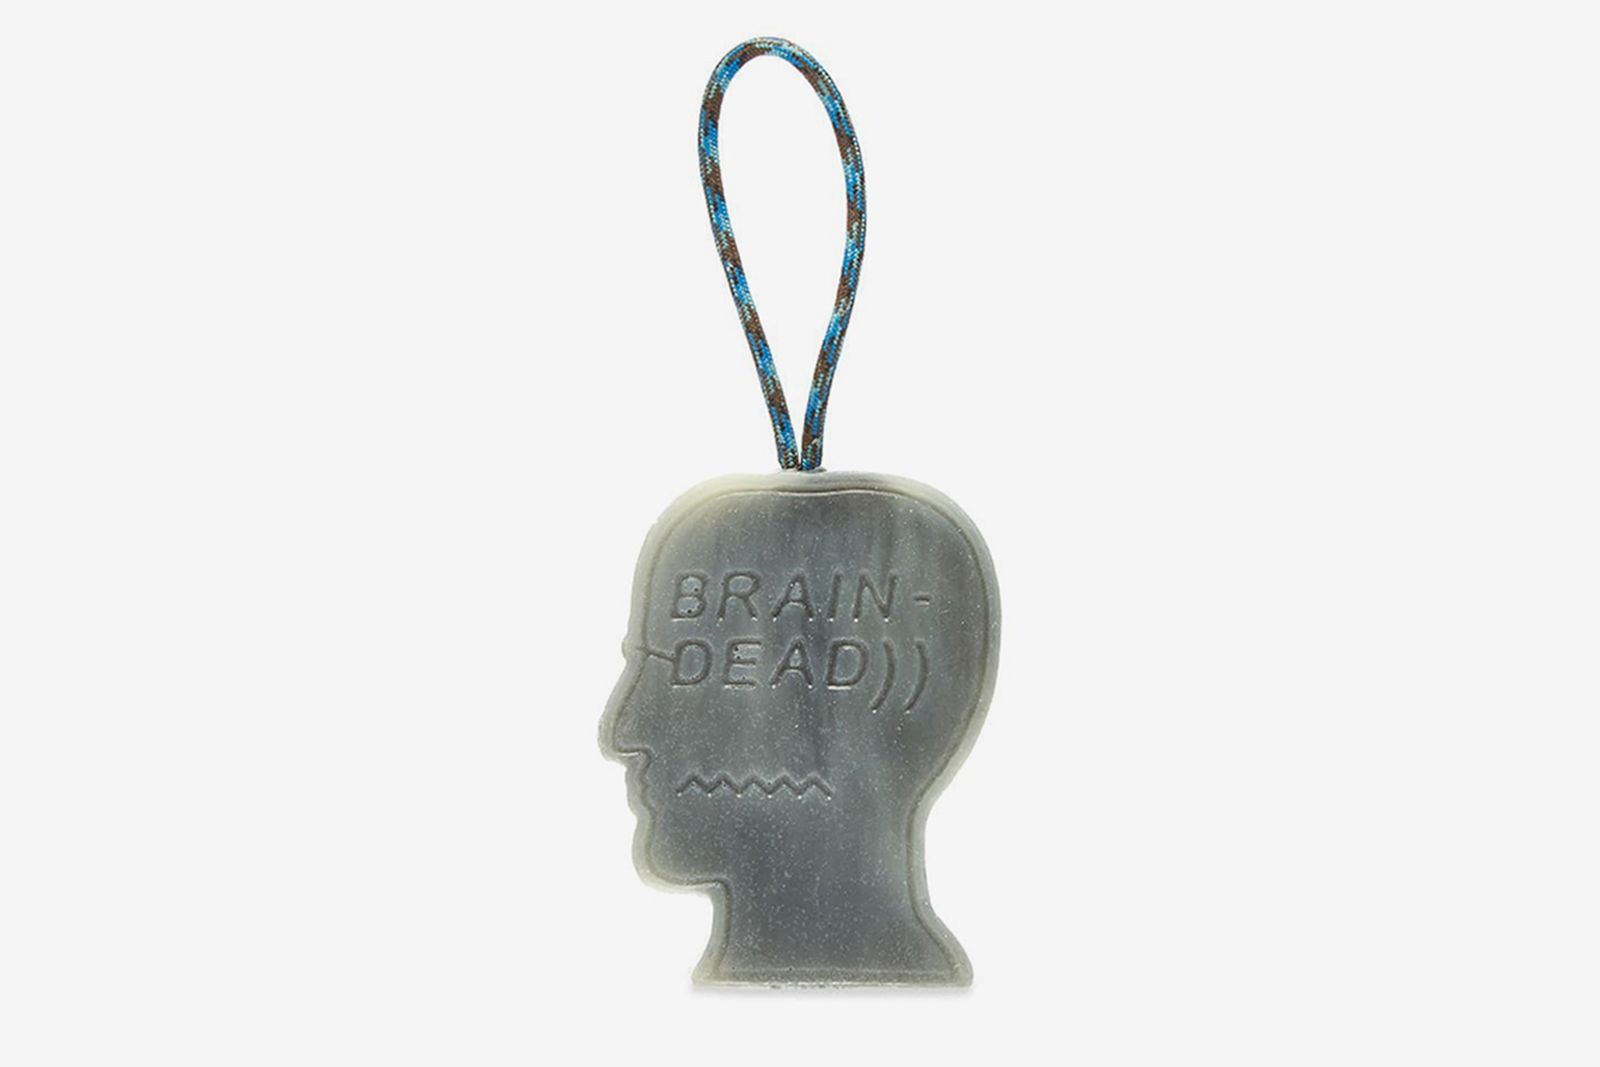 bathroom accessories main brain dead hay muji